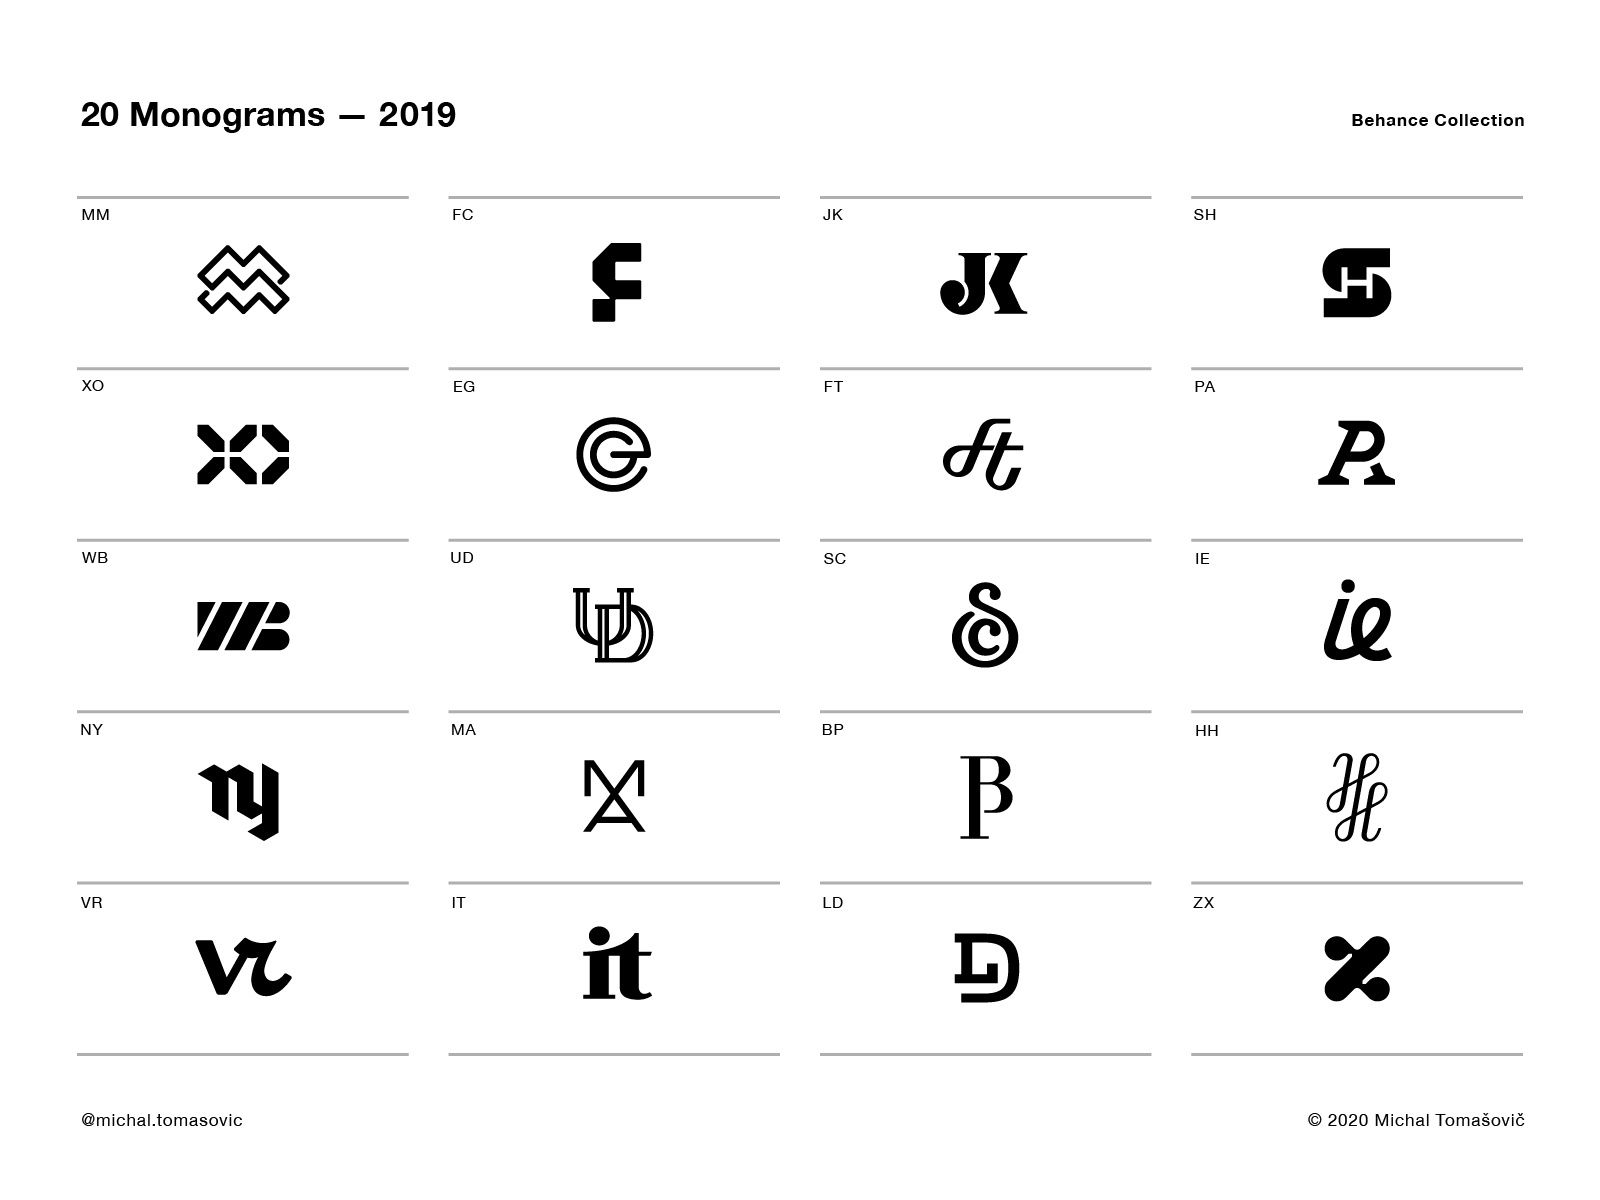 20 Monograms In